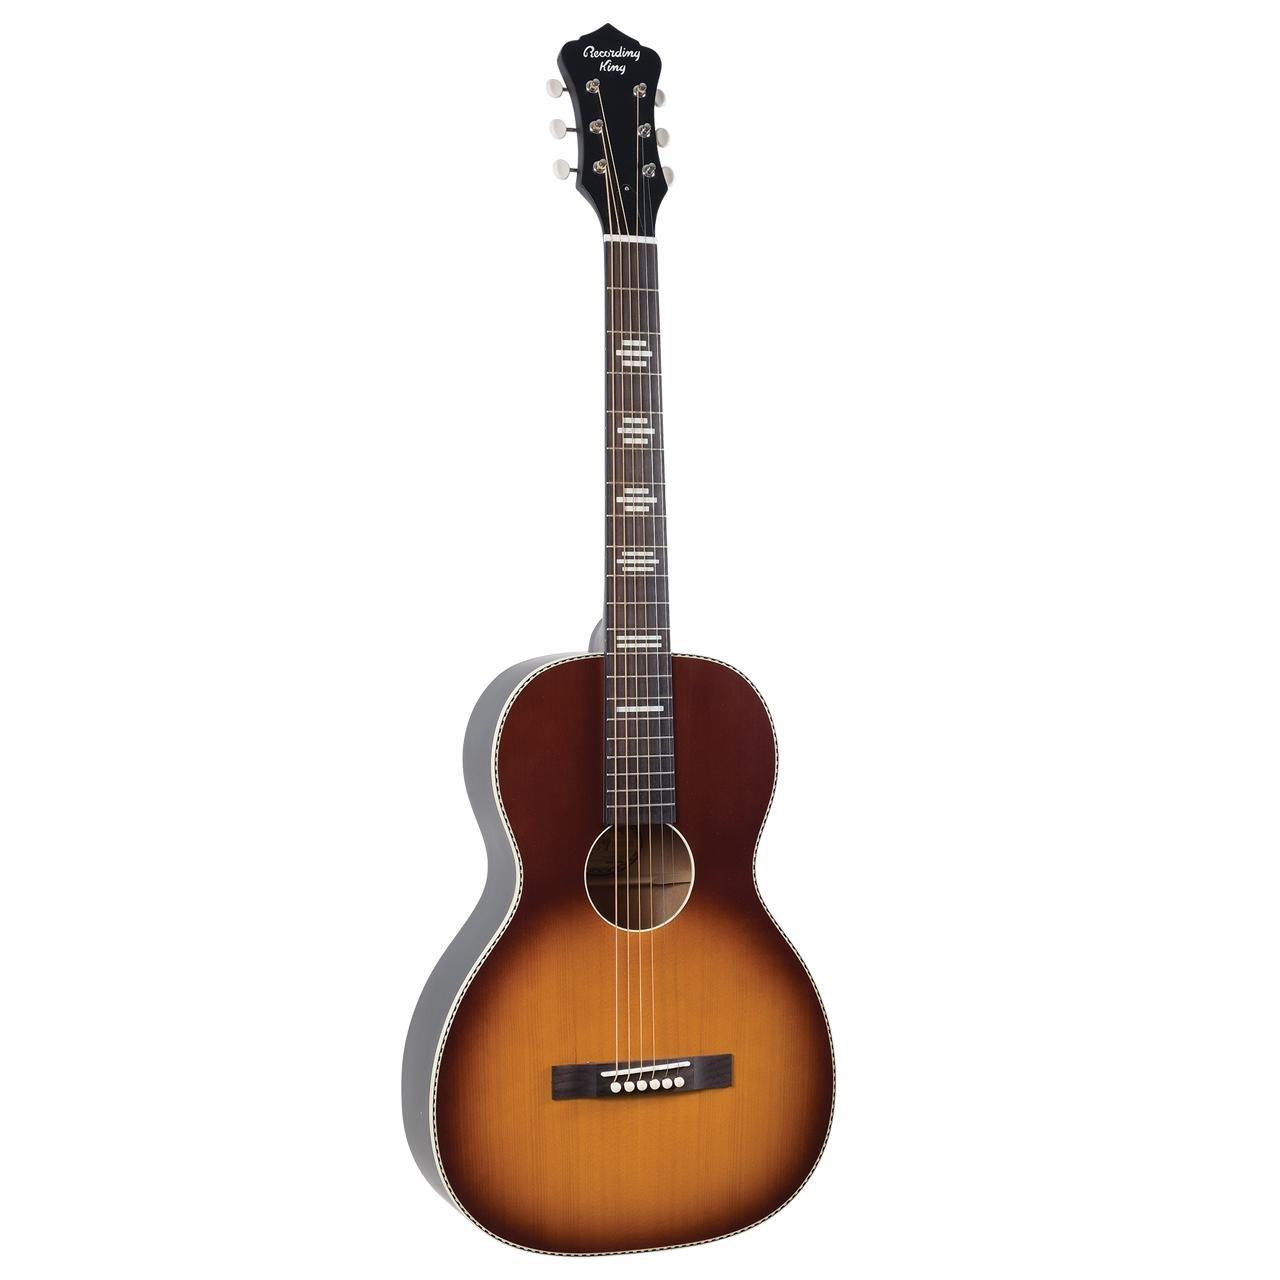 Recording King Series 7 Size 0 A/E Guitar Tobacco Sunburst